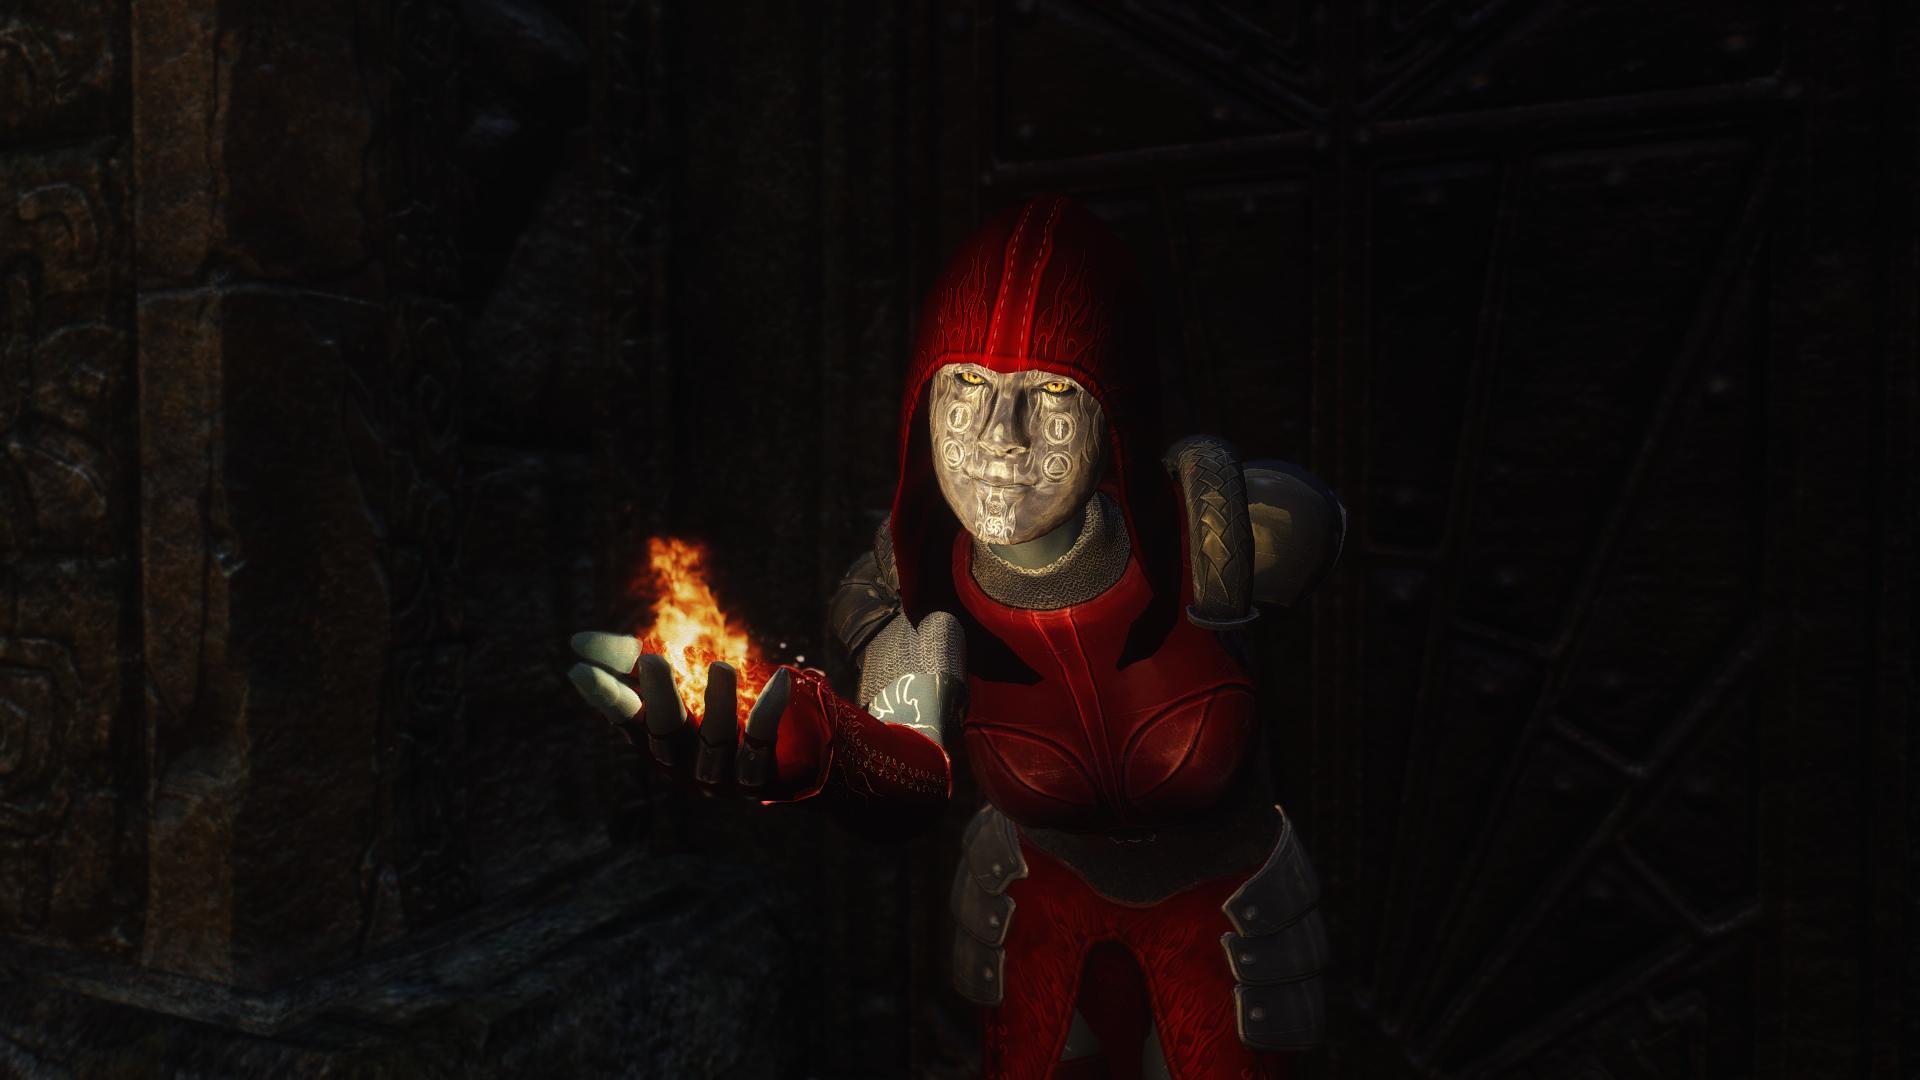 Skyrim - Броня мага-поджигателя / Pyro Mage Armor